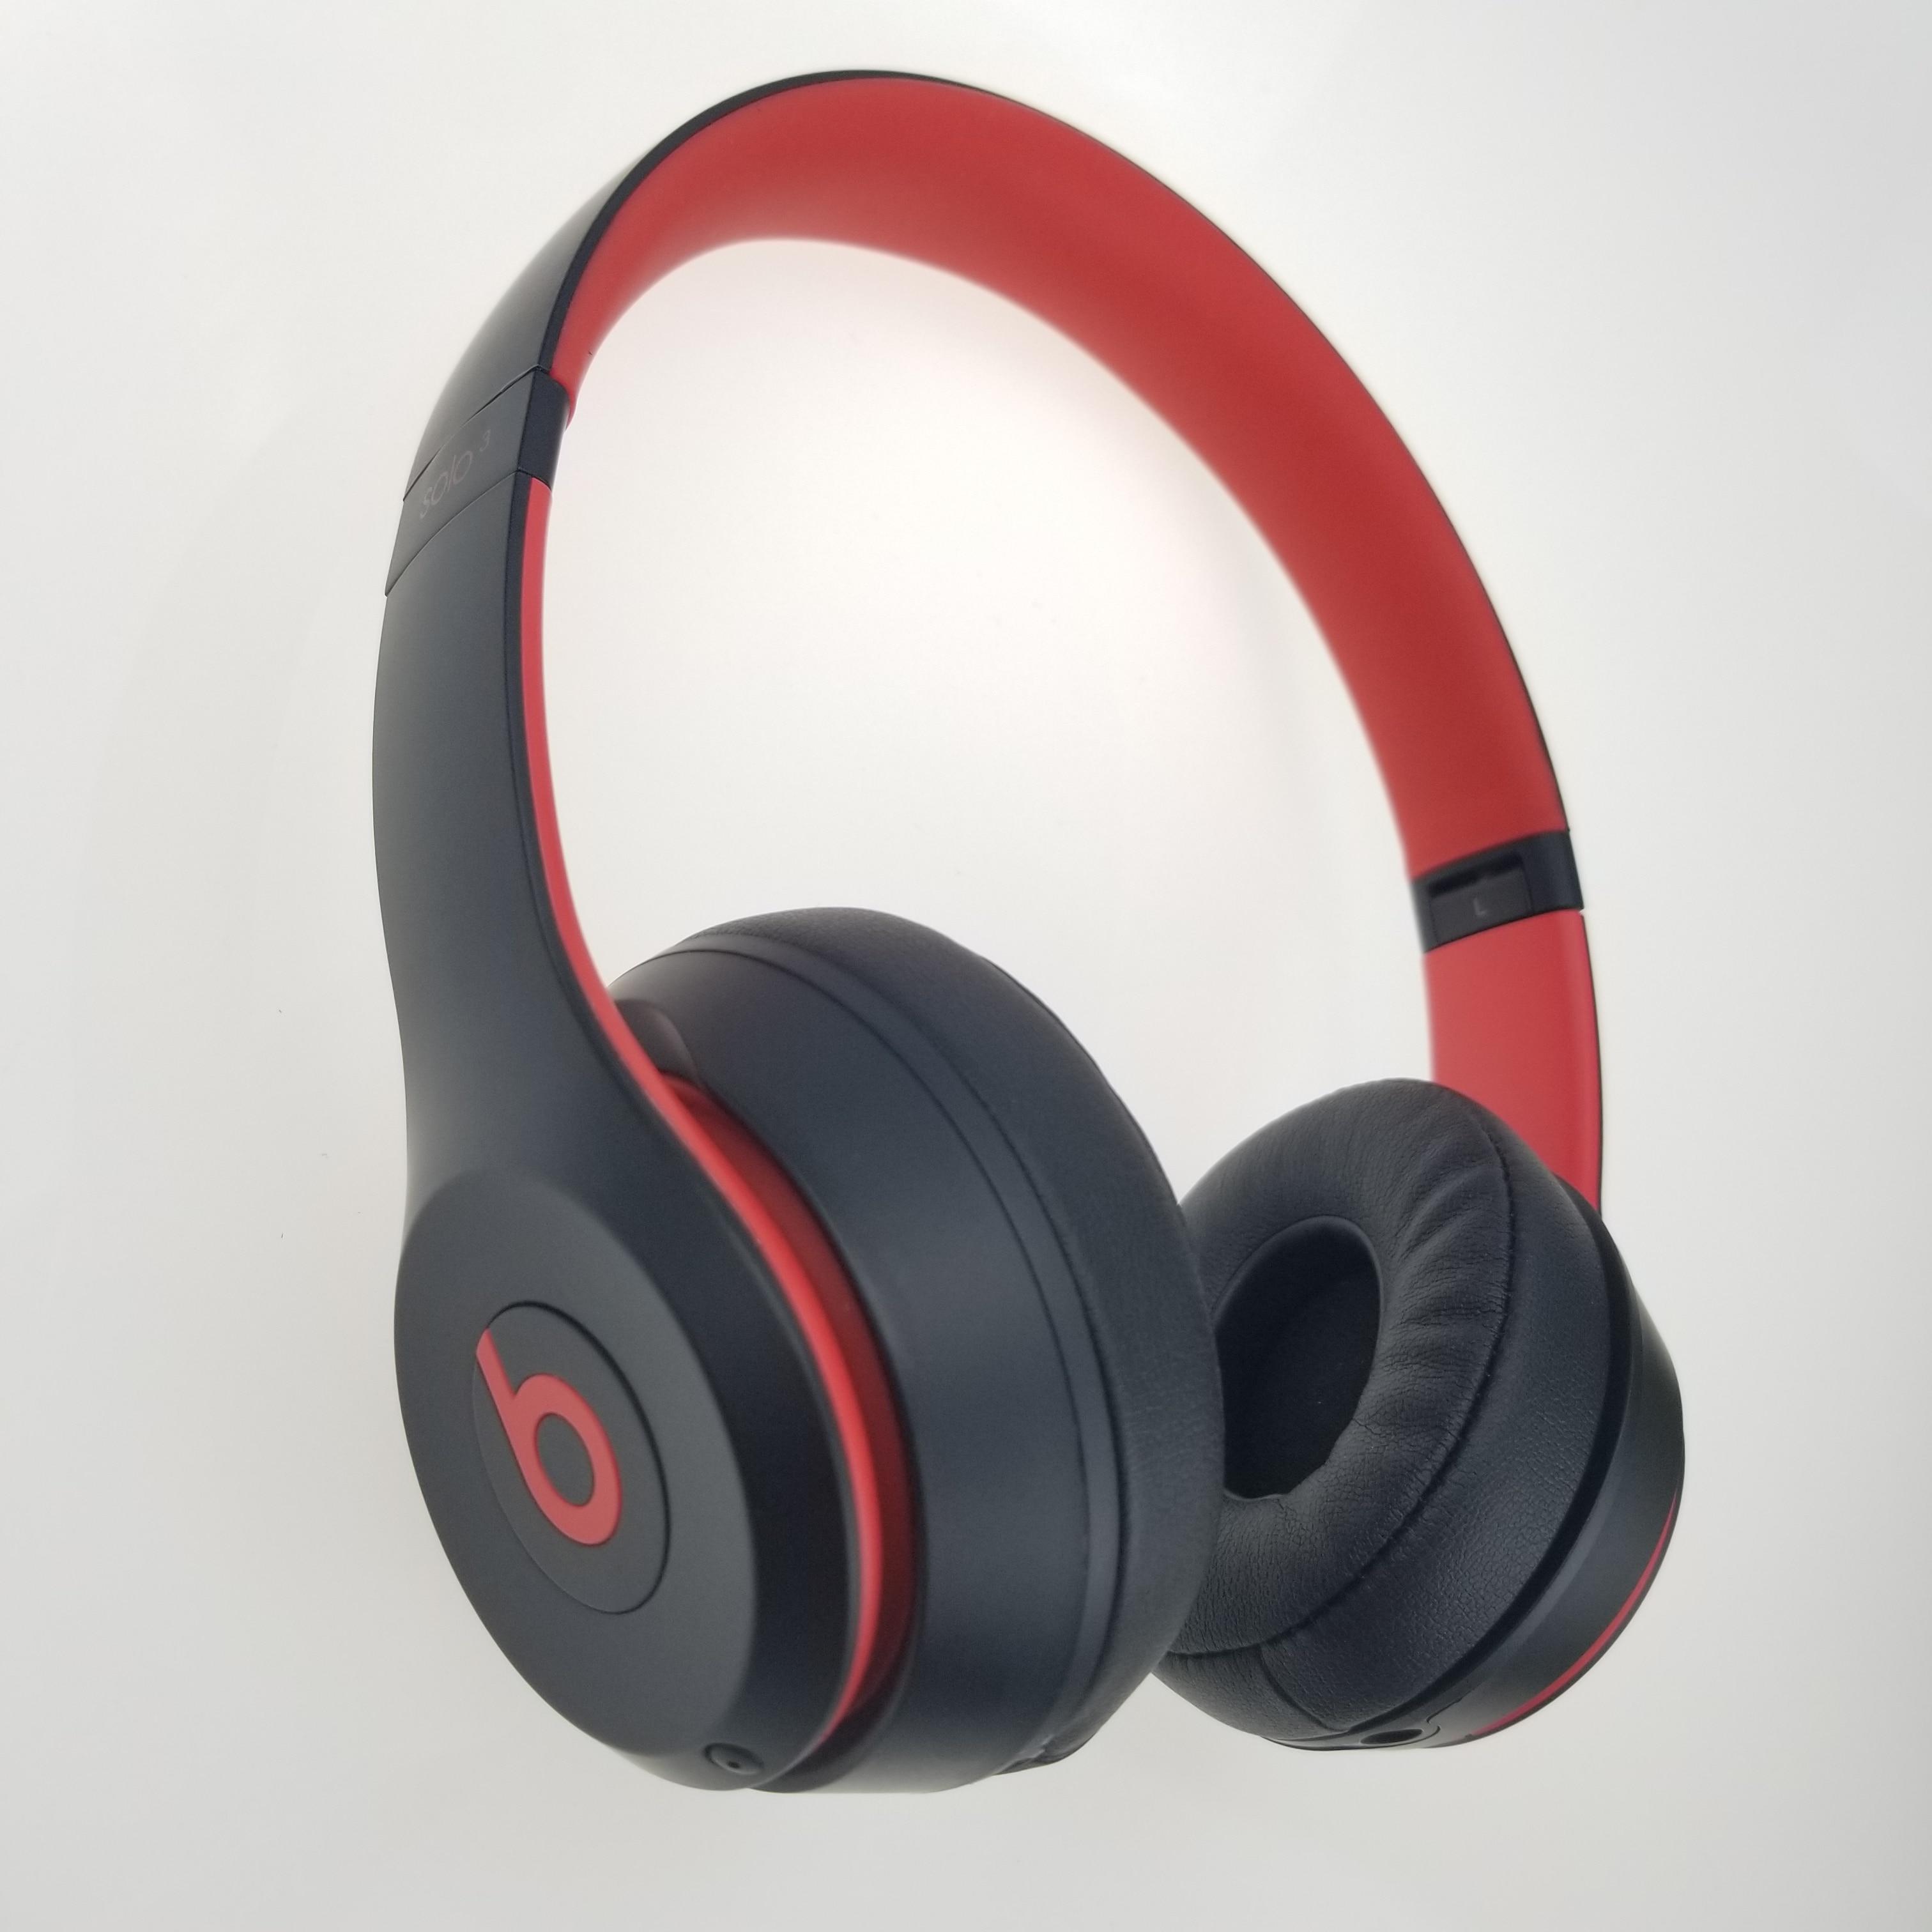 Beats Solo Original sobre-oreja auriculares manos libres inalámbrico Bluetooth carga rápida Anti ruido